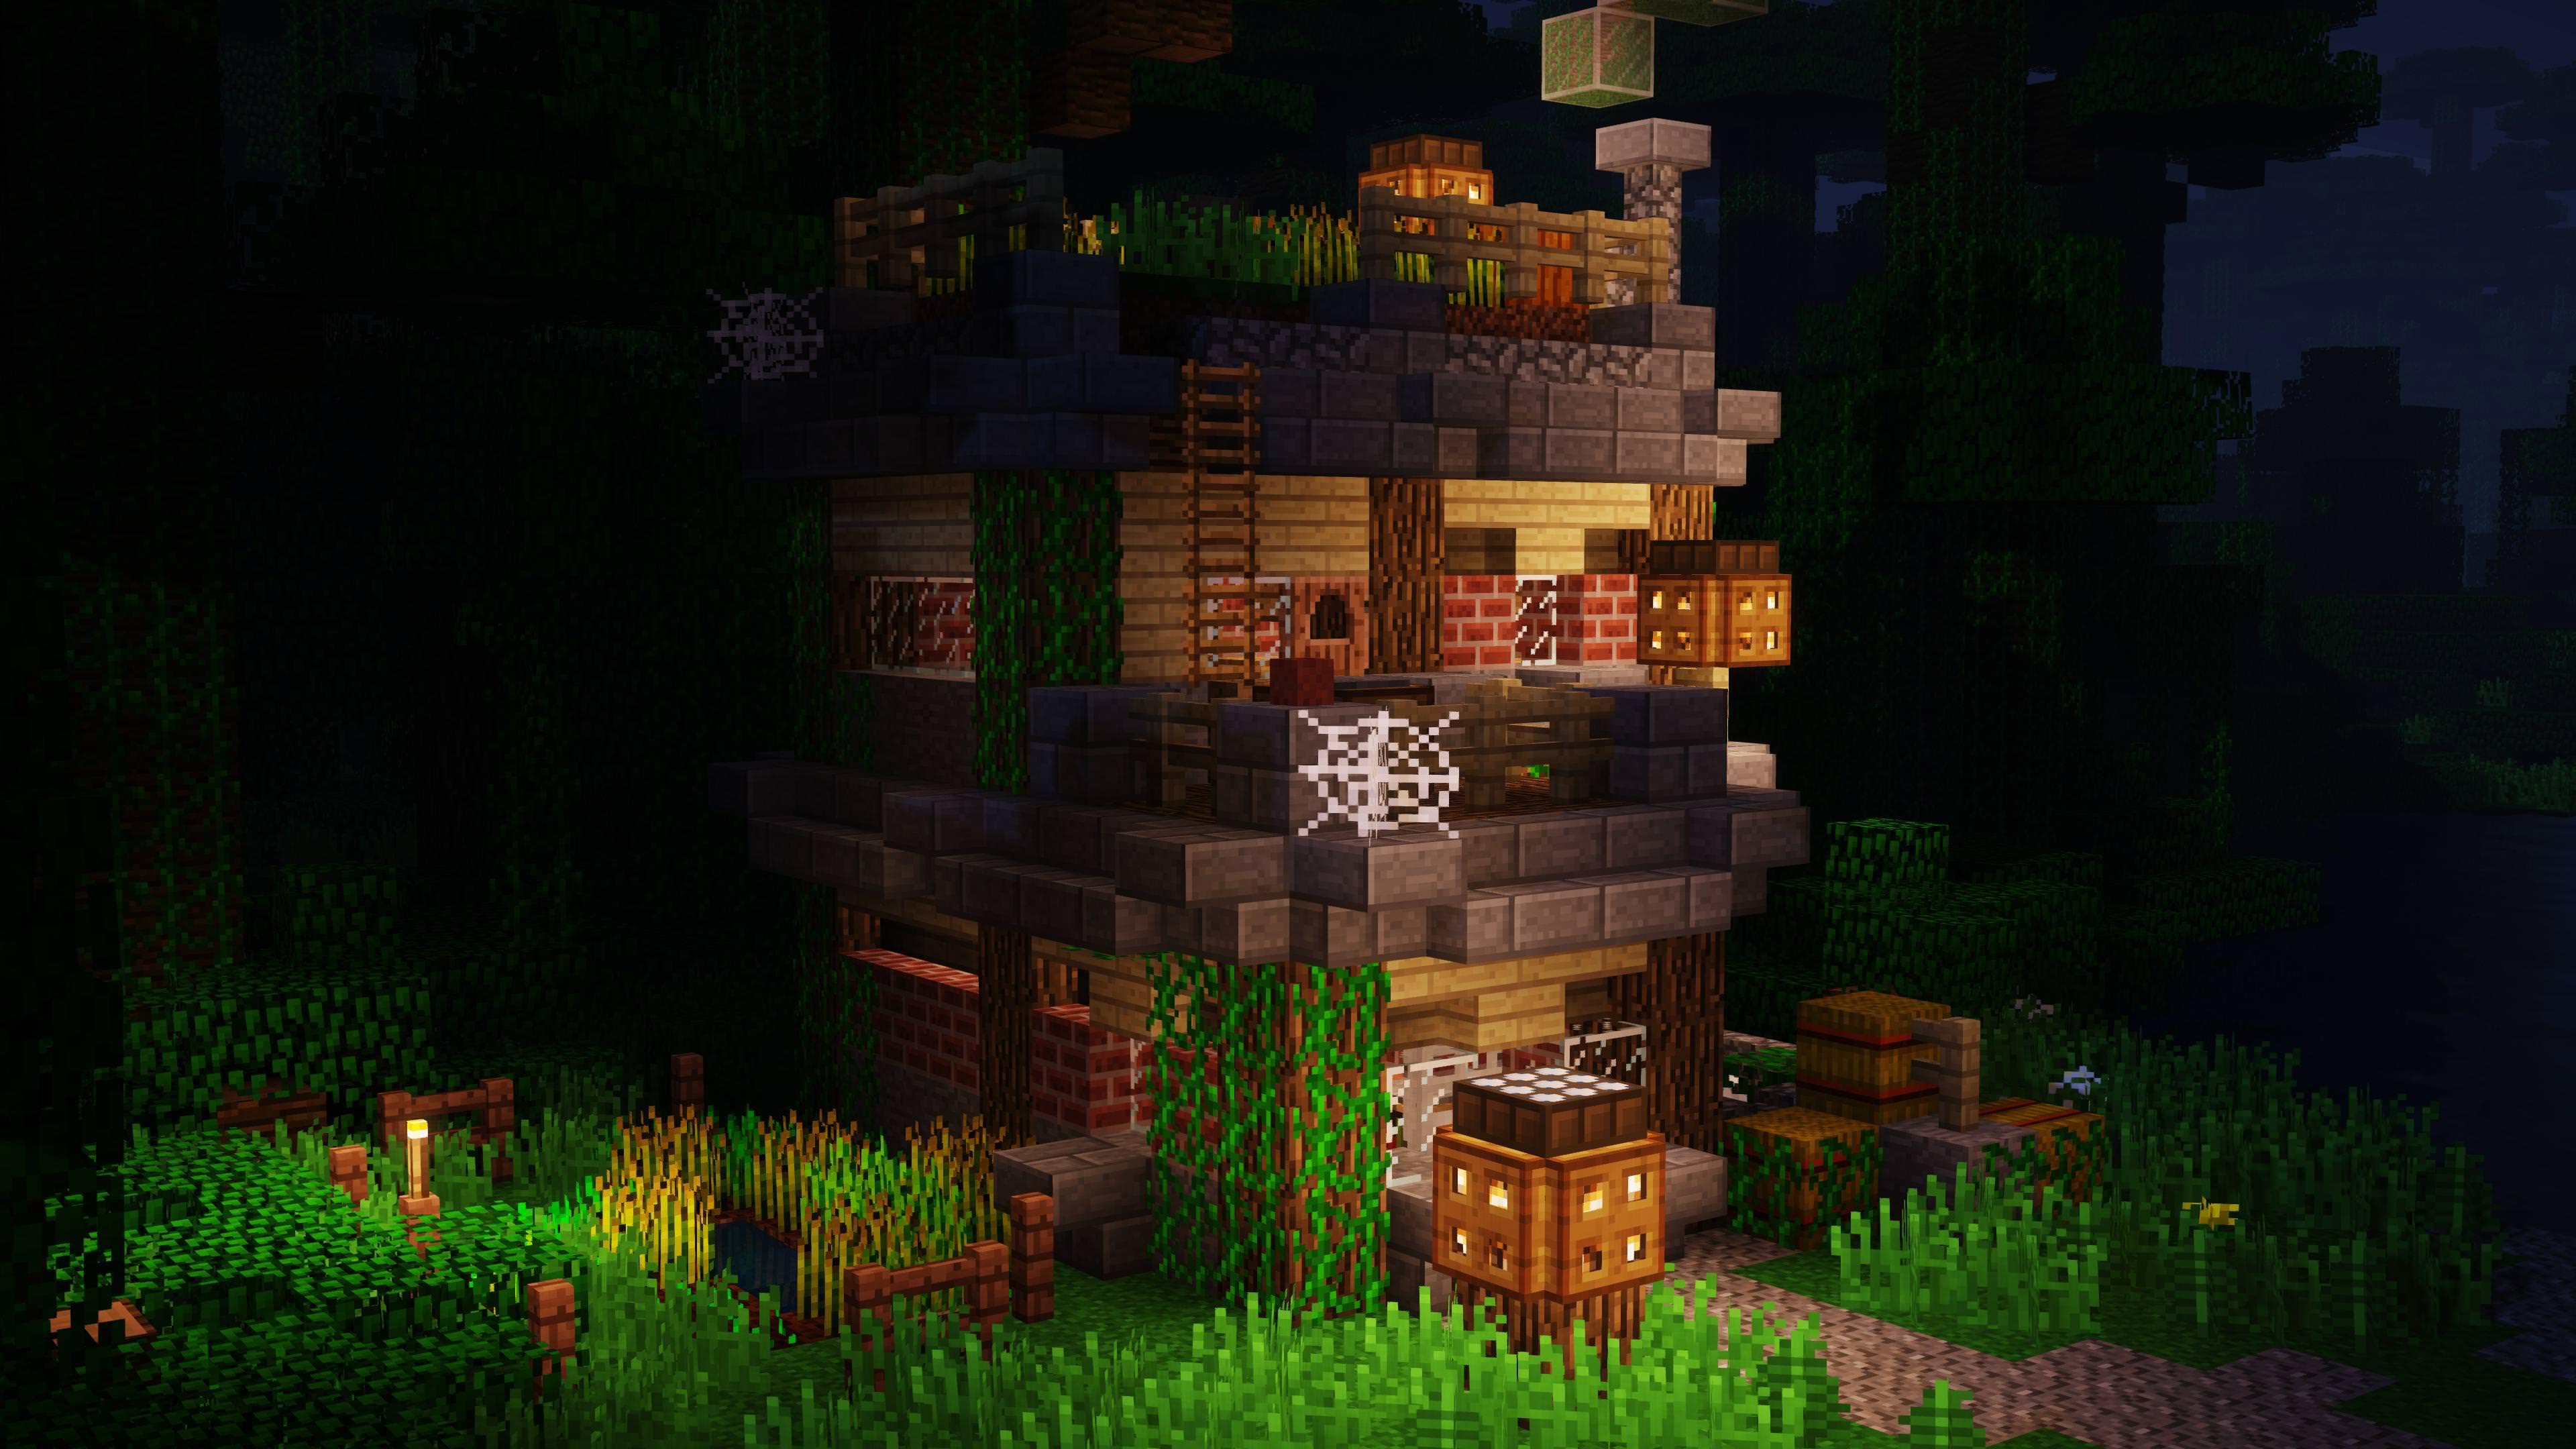 MinecraftingIR